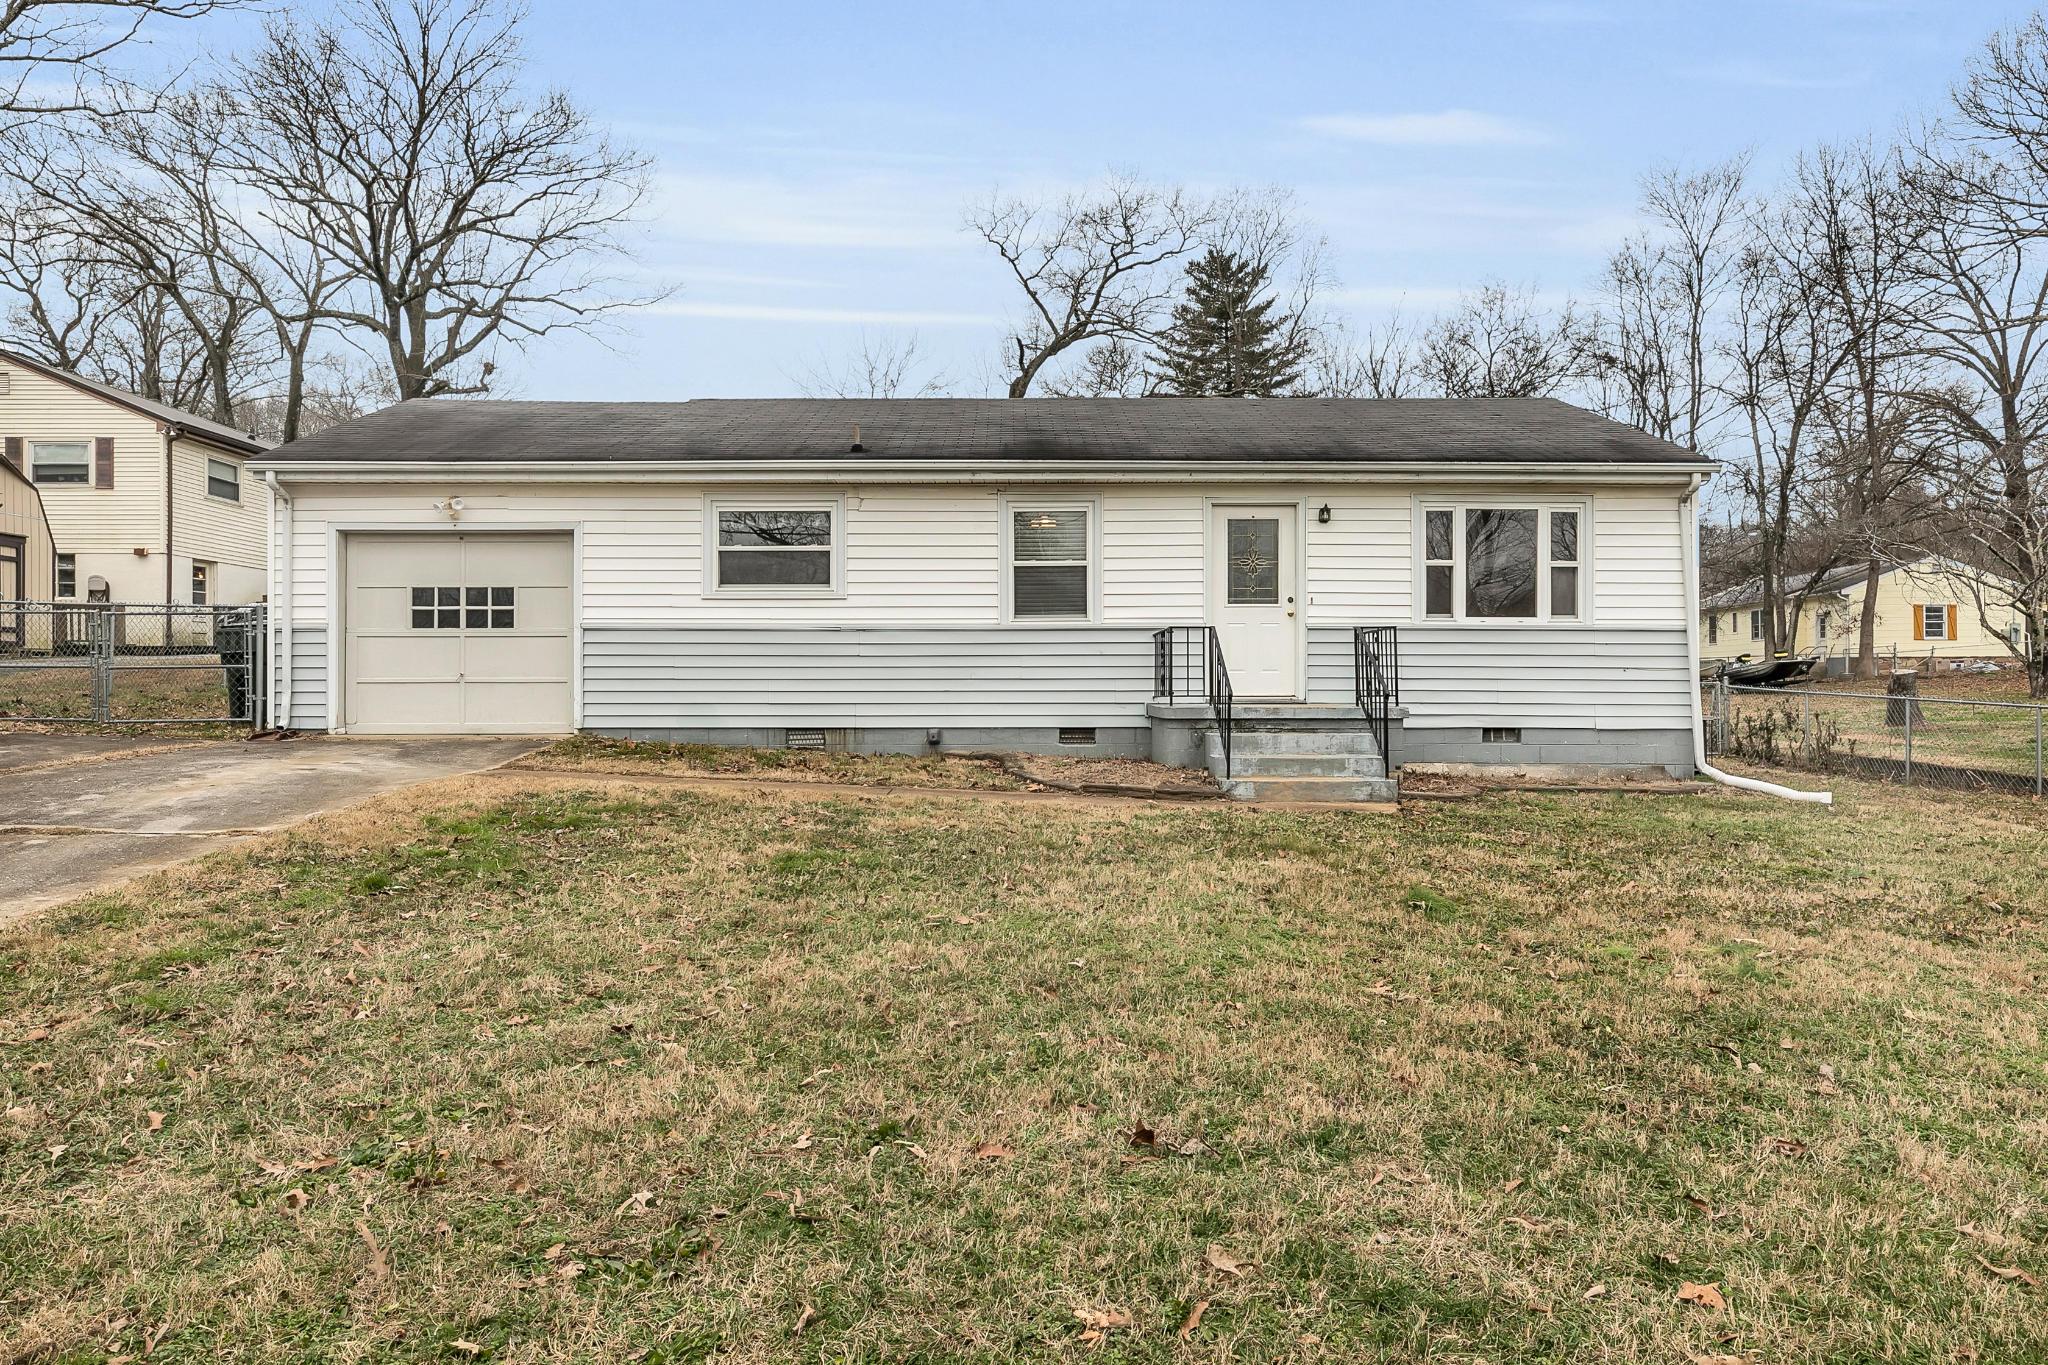 3811 Birmingham Dr, Chattanooga, TN 37415